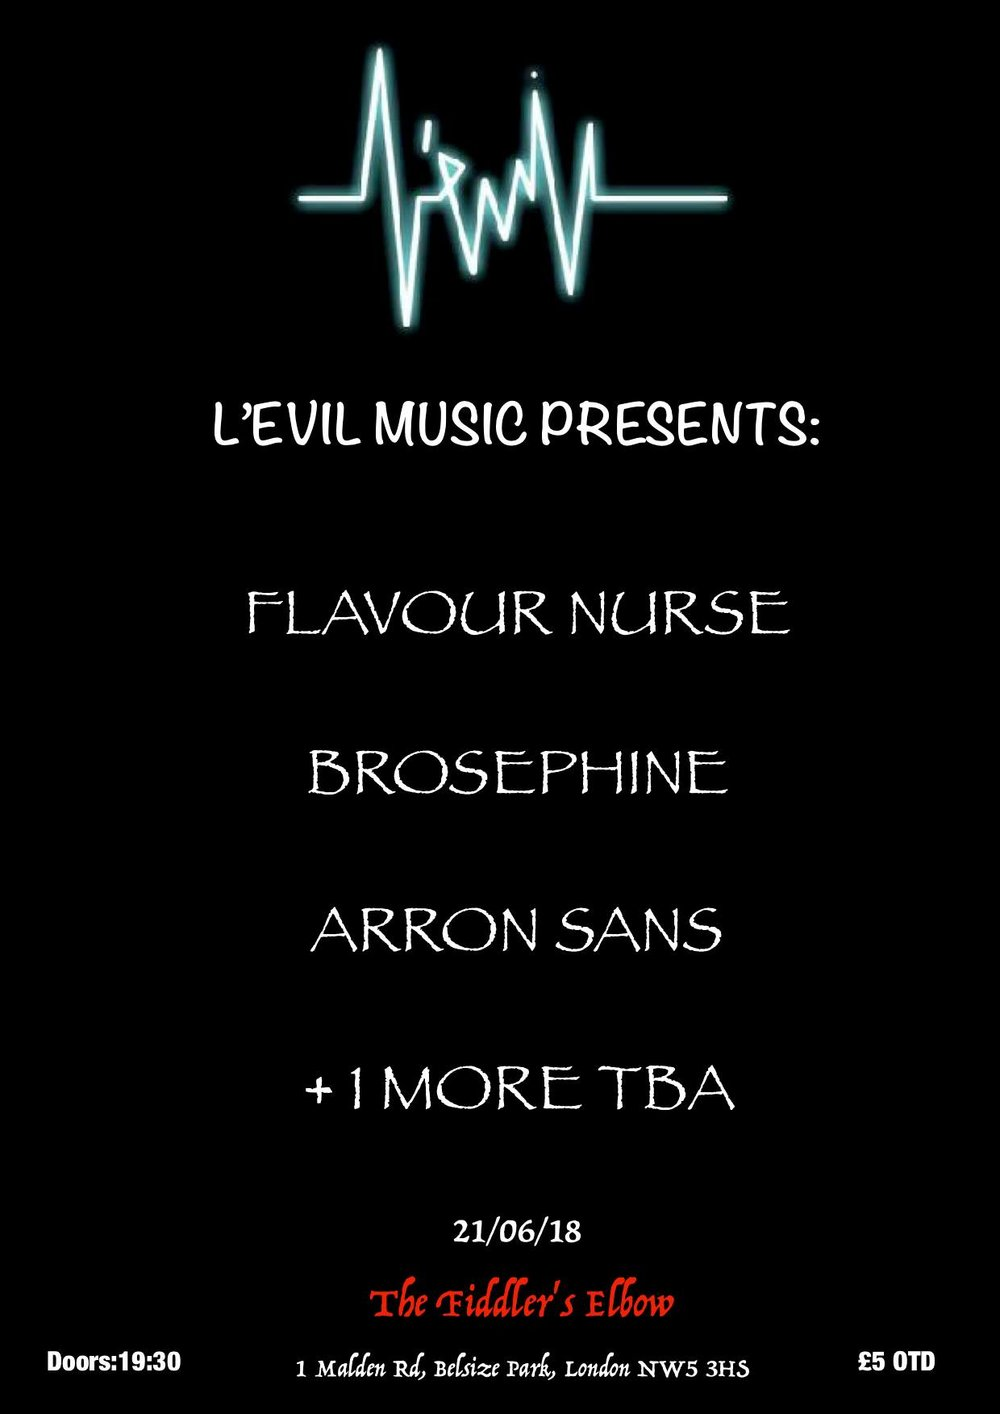 L'Evil Music Presents: Flavour Nurse, Brosephine + More at The Fiddler's Elbow promotional image